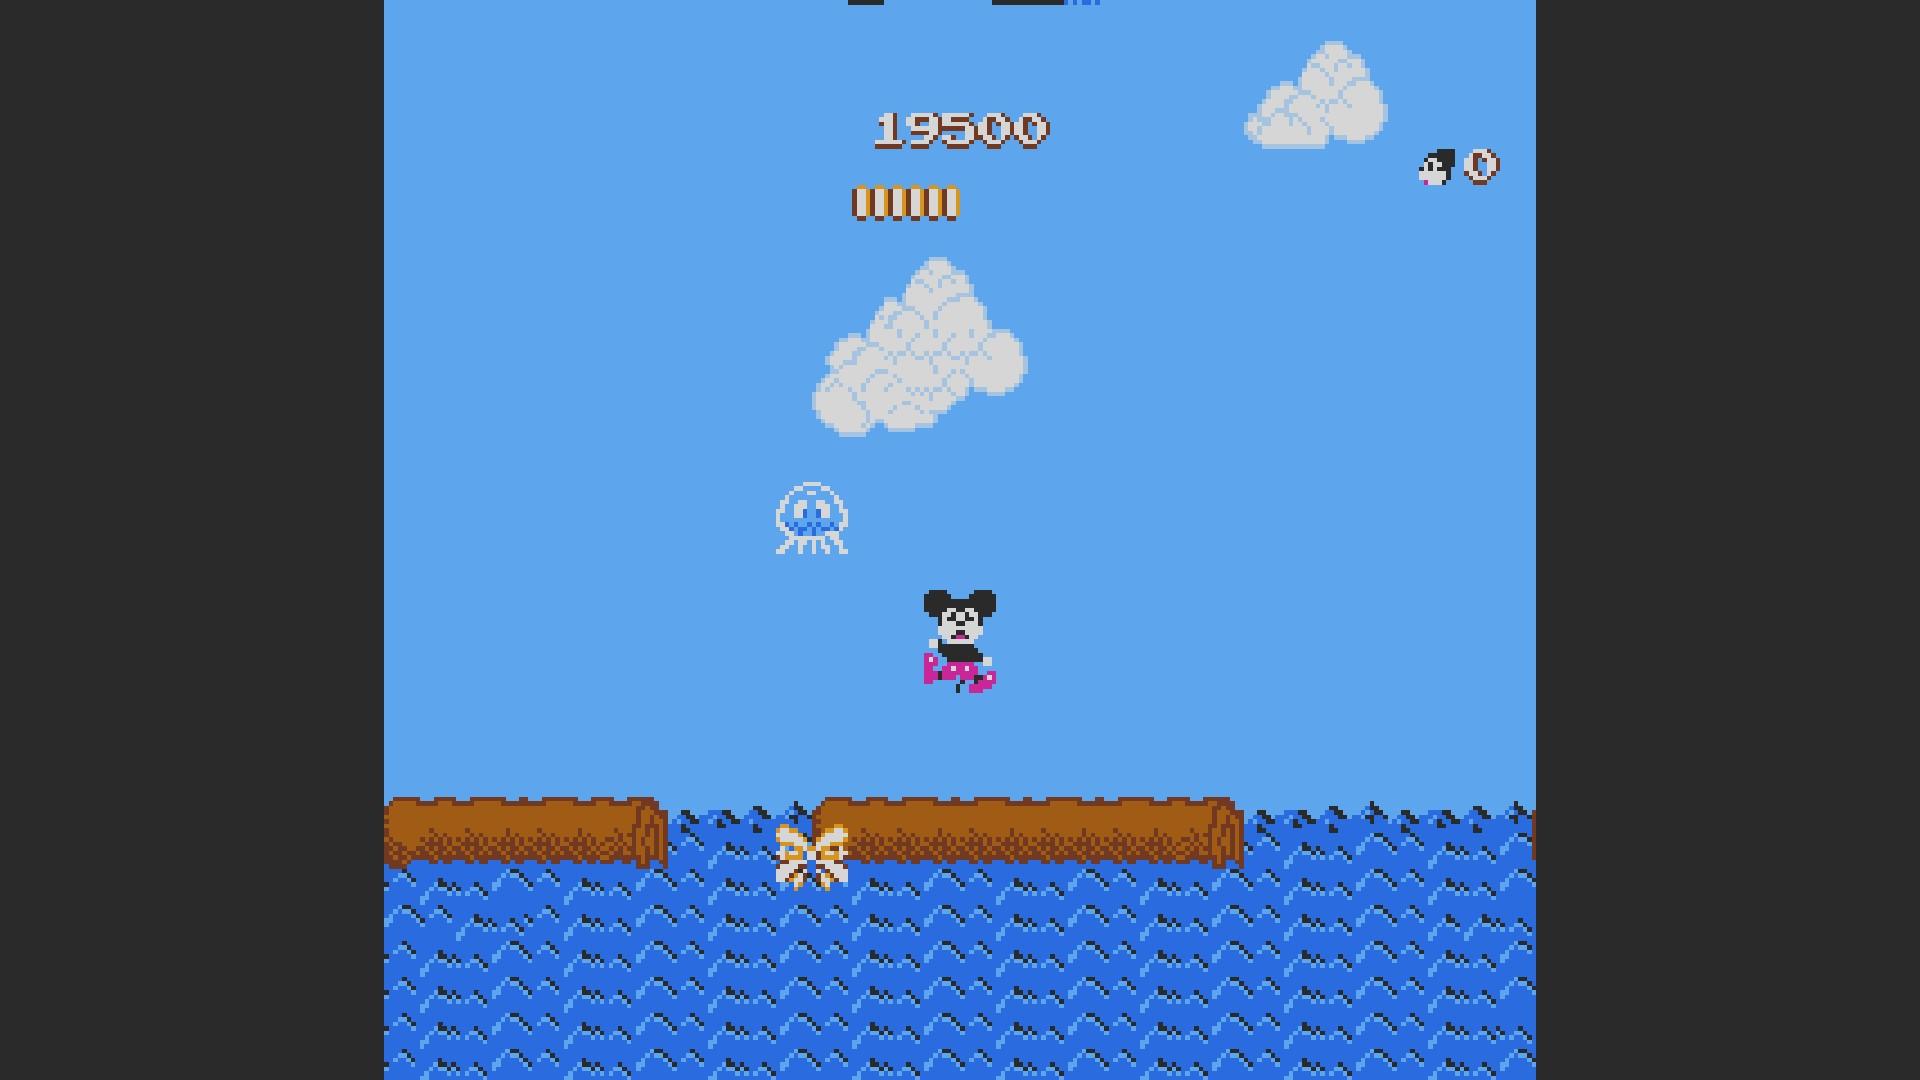 AkinNahtanoj: Mickey Mousecapade (NES/Famicom Emulated) 19,500 points on 2020-10-12 05:08:52